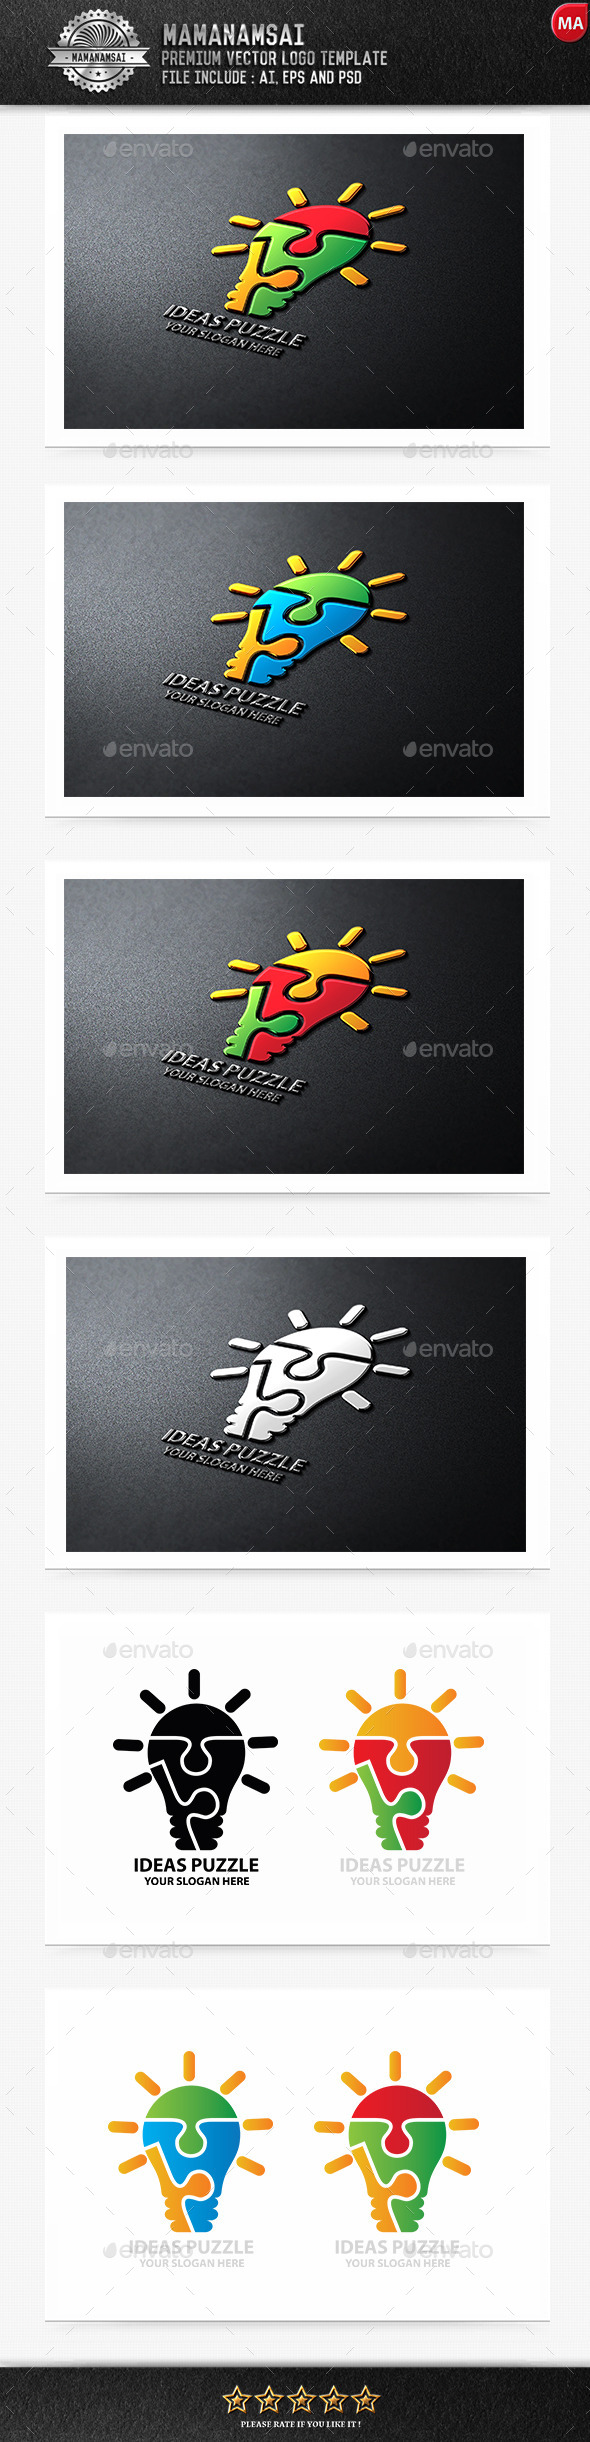 Idea Puzzle Logo - Logo Templates